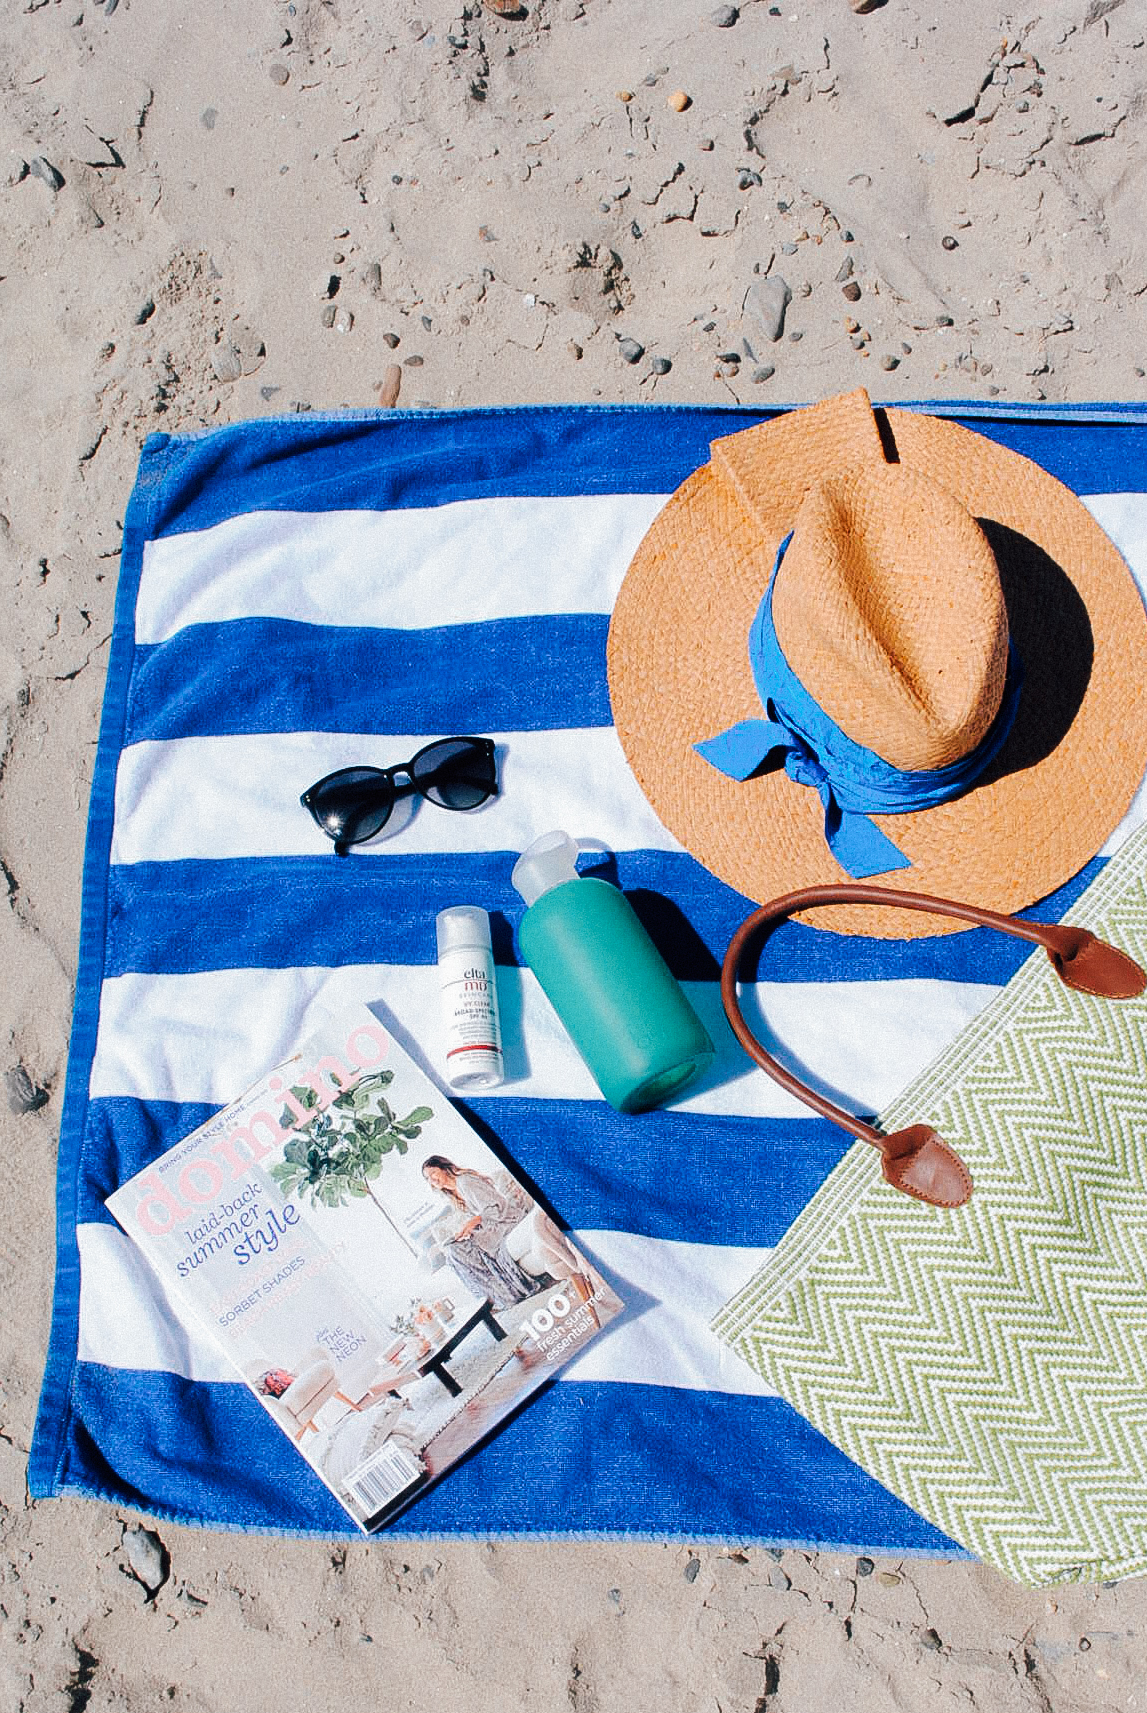 Beach Bag Essentials: Elta MD sunscreen, Oliver Peoples Sugnalsses, Lola Hat, Domino Magazine, BRK Waterbottle.